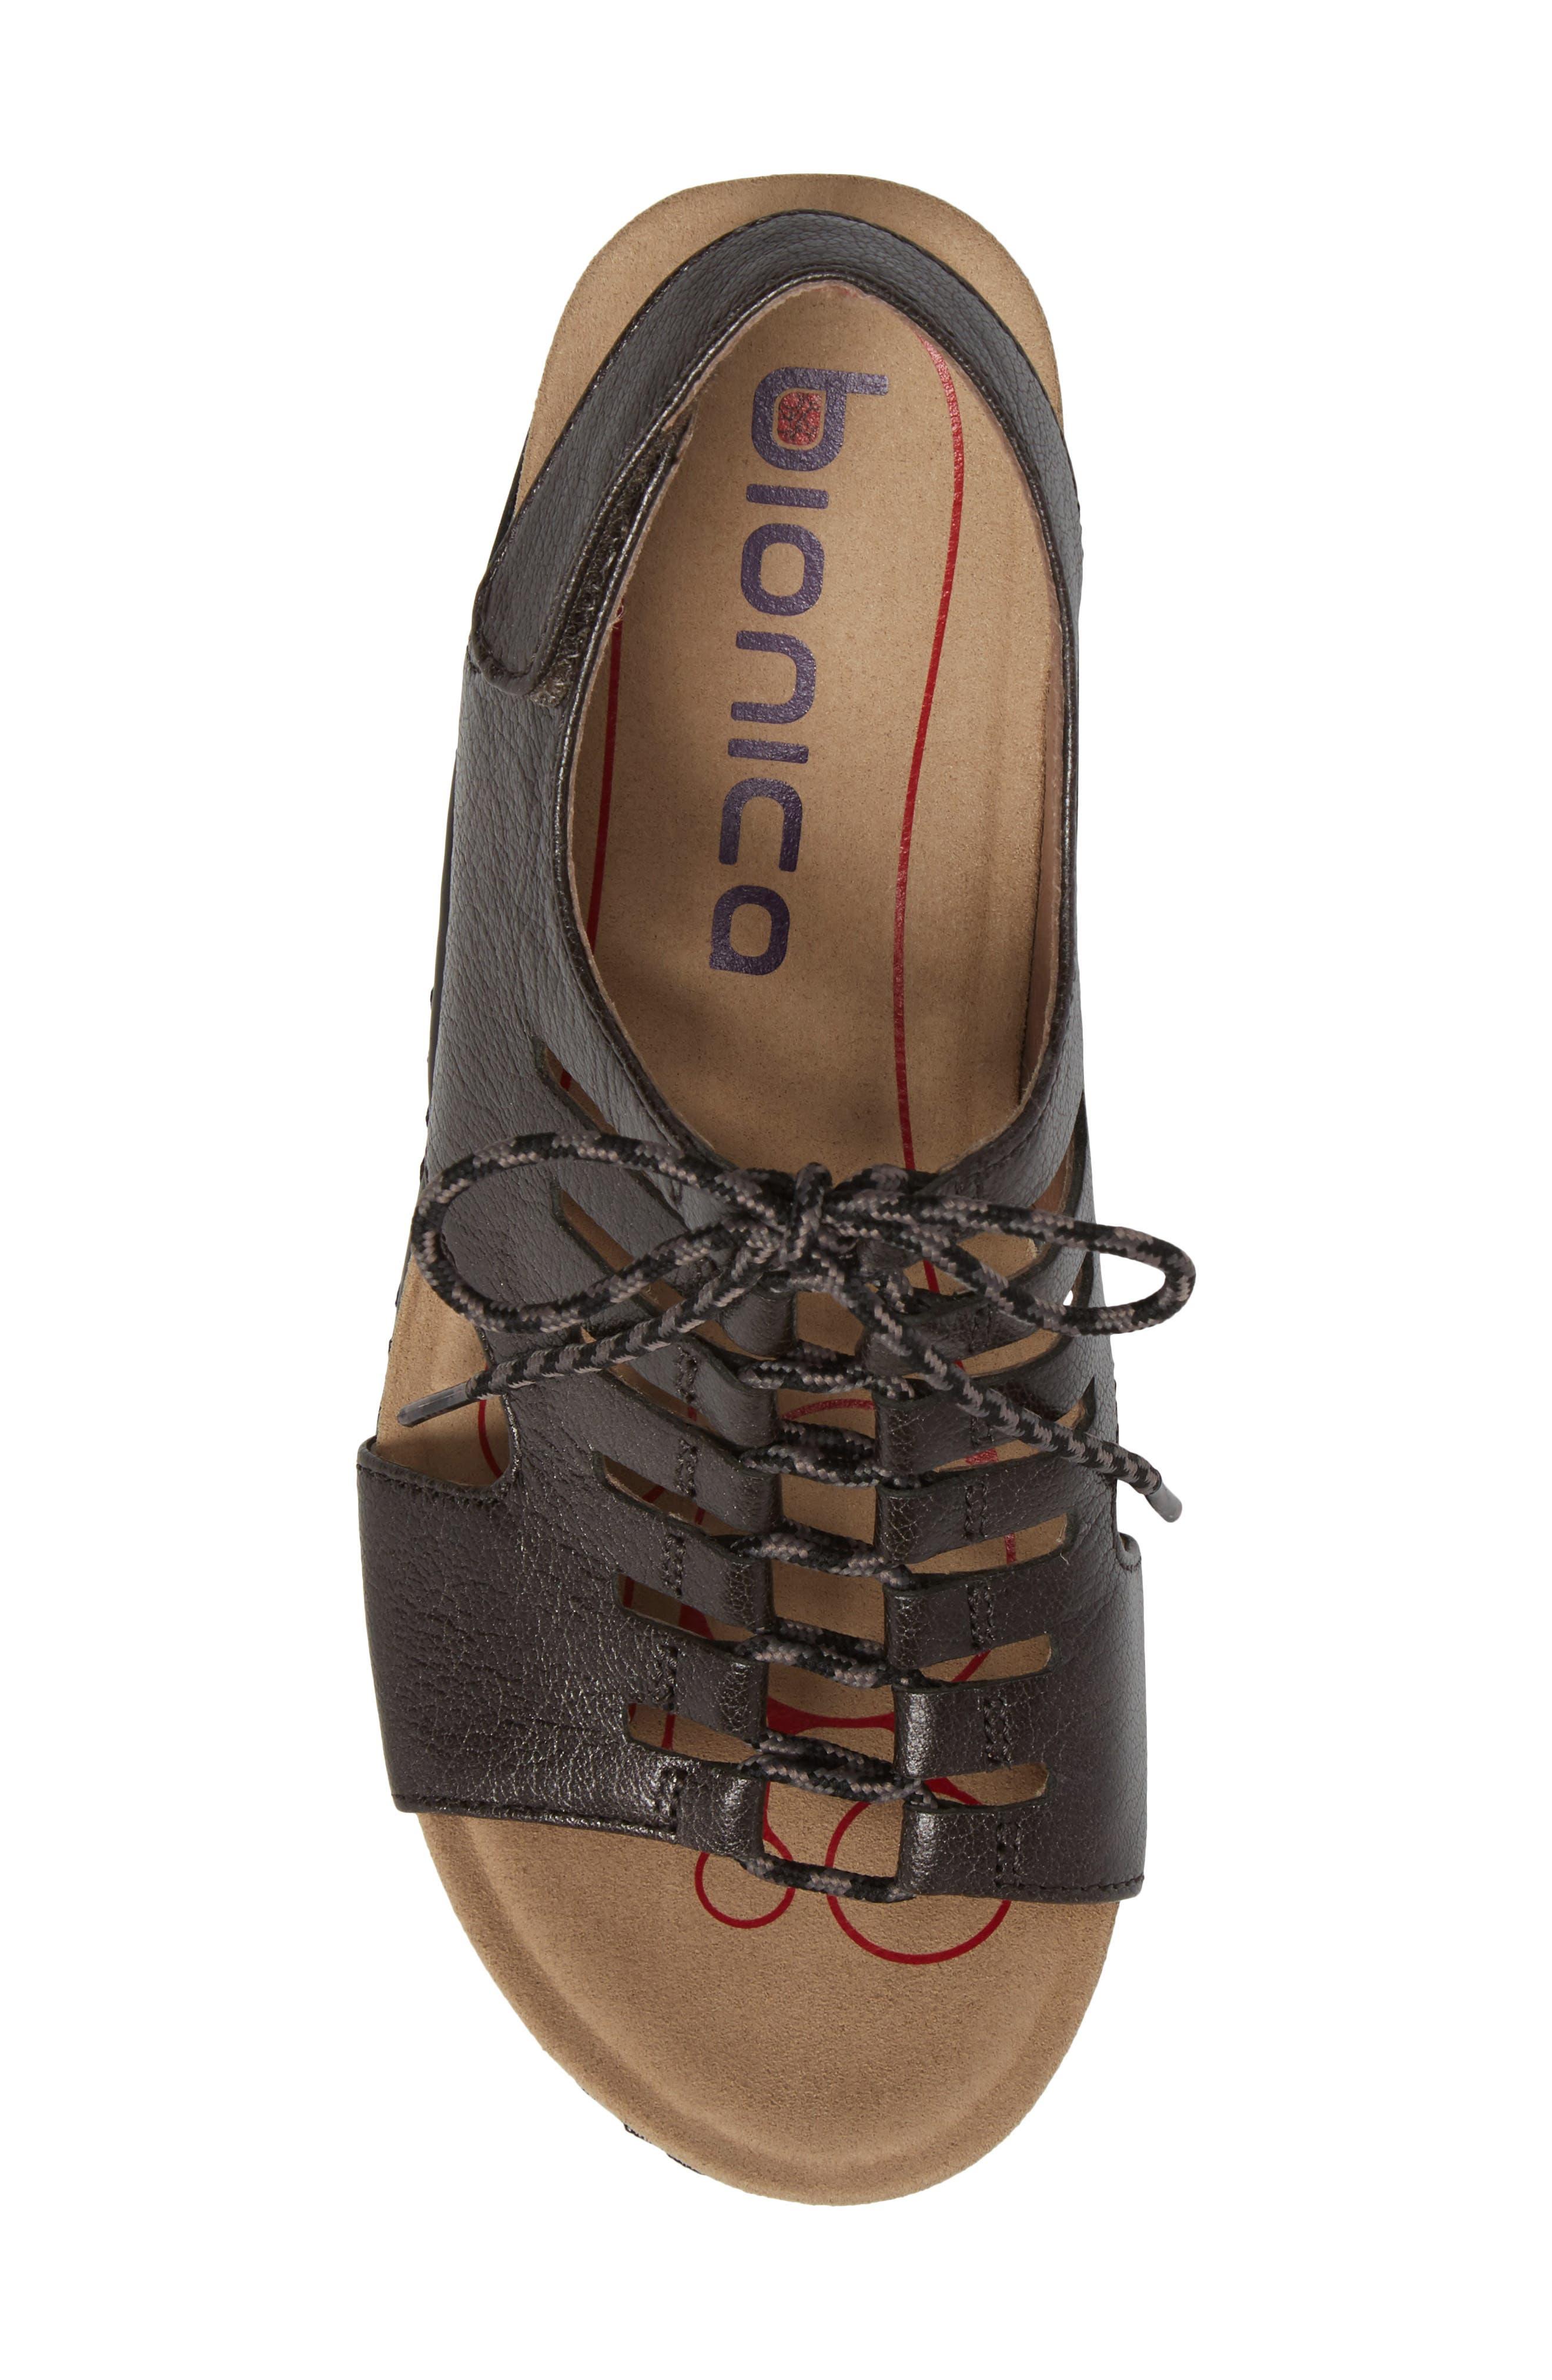 Sirus Wedge Sandal,                             Alternate thumbnail 5, color,                             040